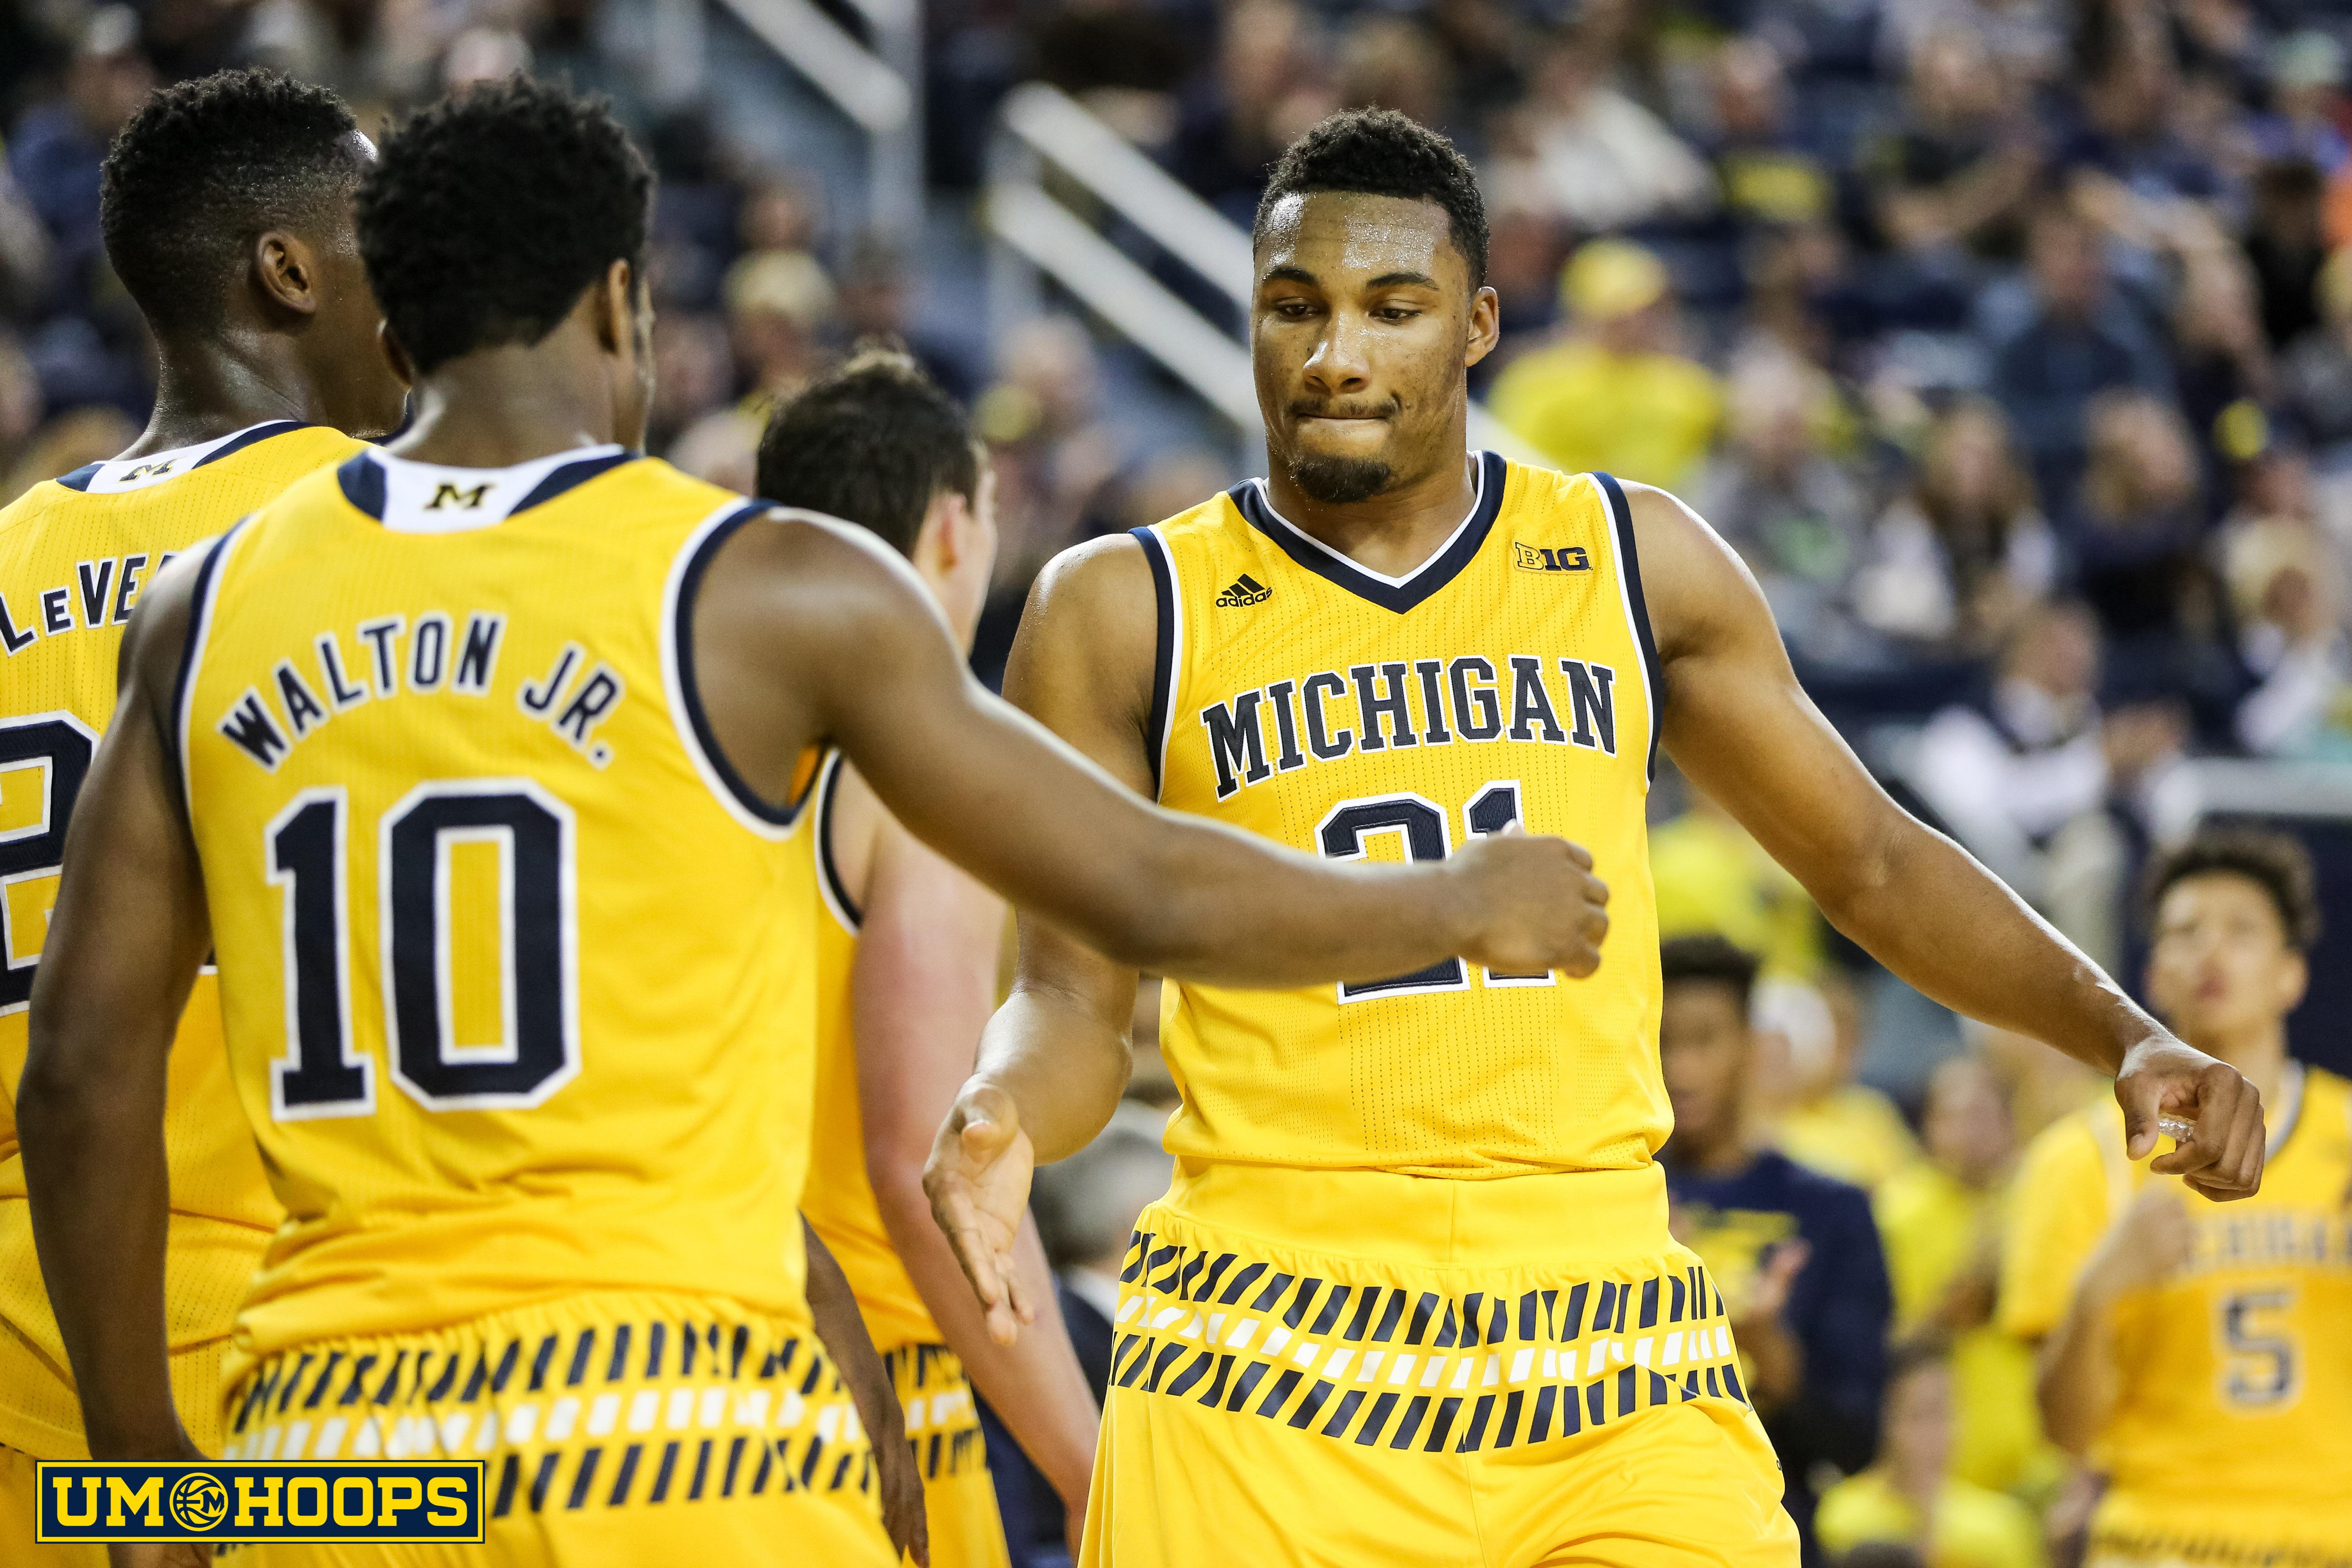 Michigan 96, Bryant 60-21